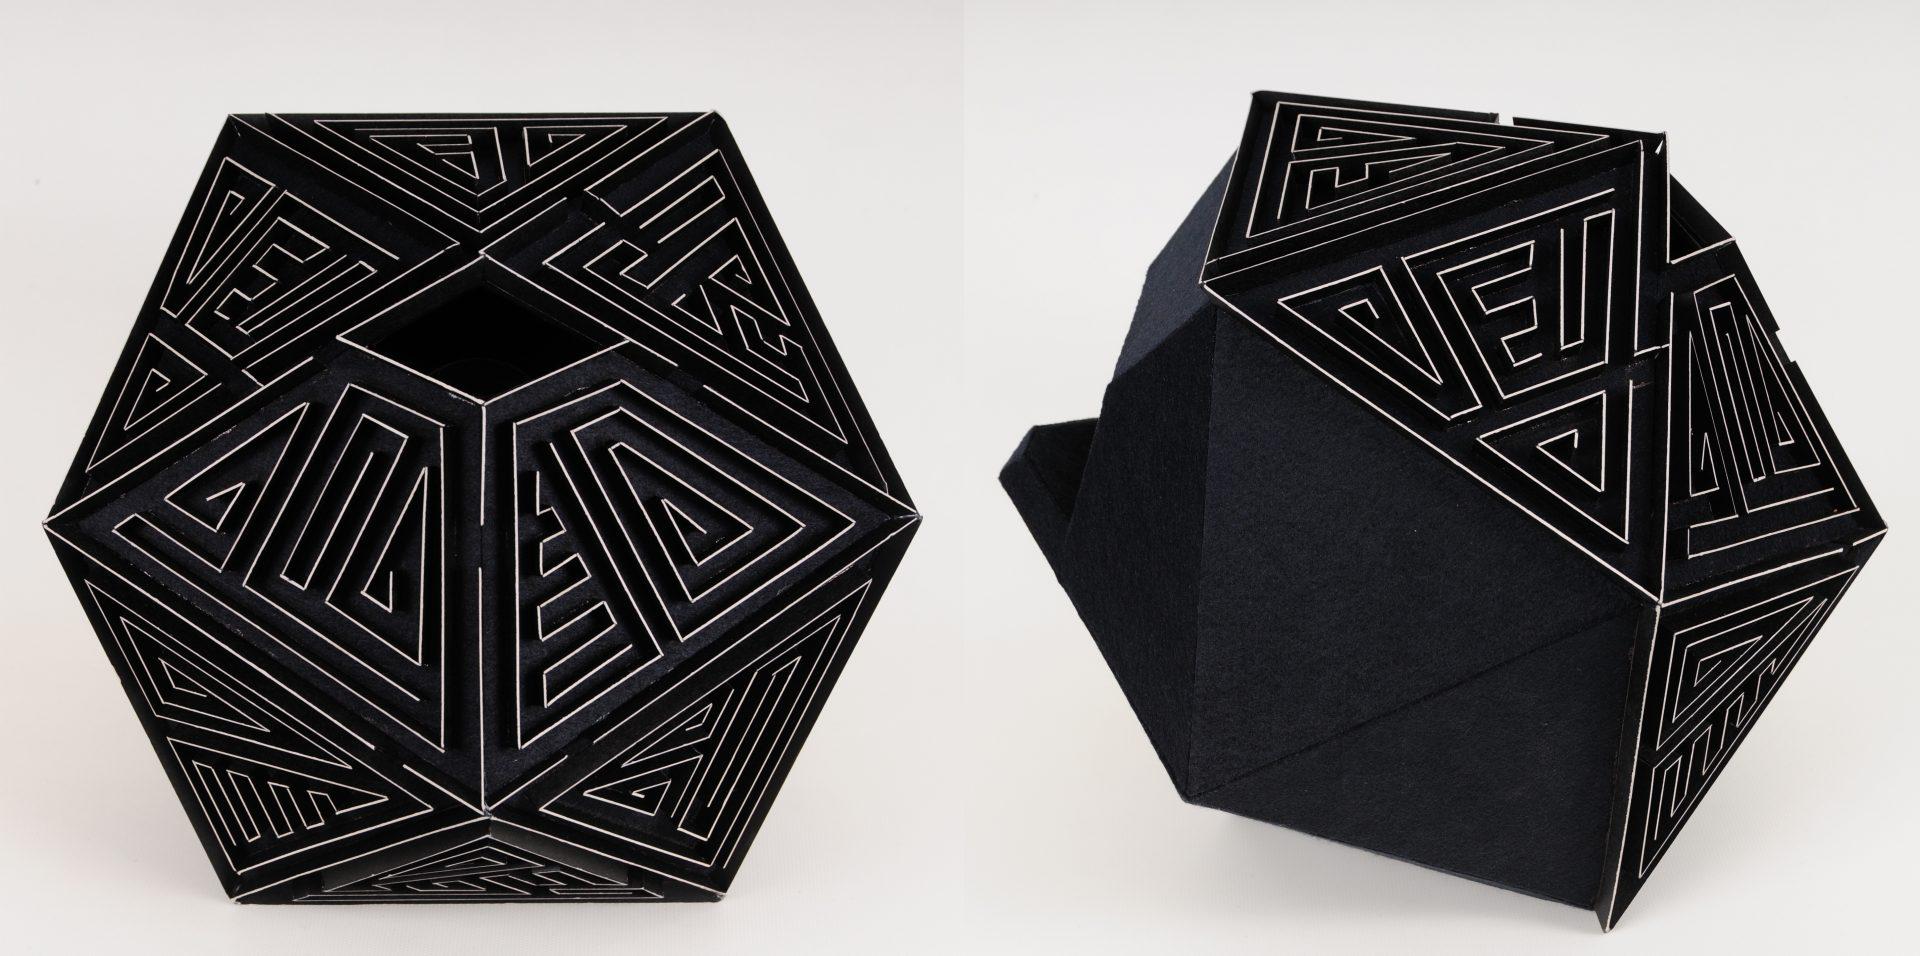 CT-003 cardboard,felt,camera obscura 33x33x33cm